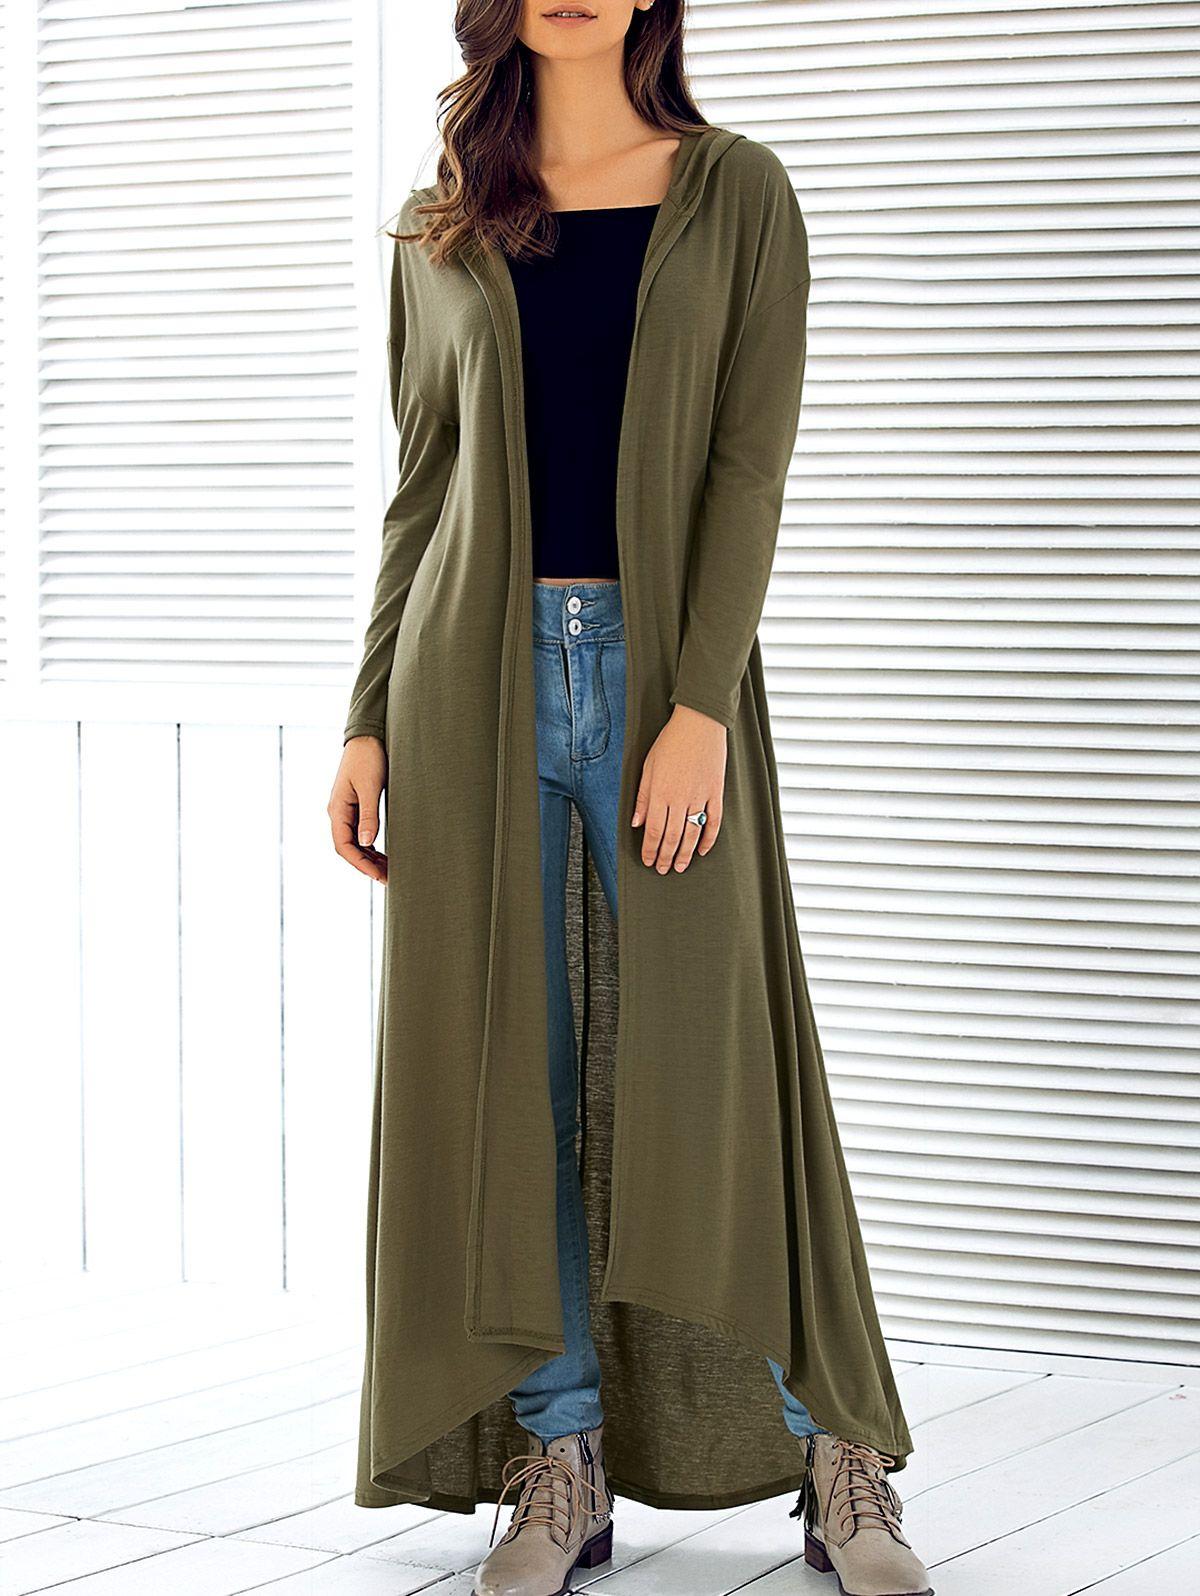 Hooded maxi long duster cardigan maxi cardigan long sleeve maxi